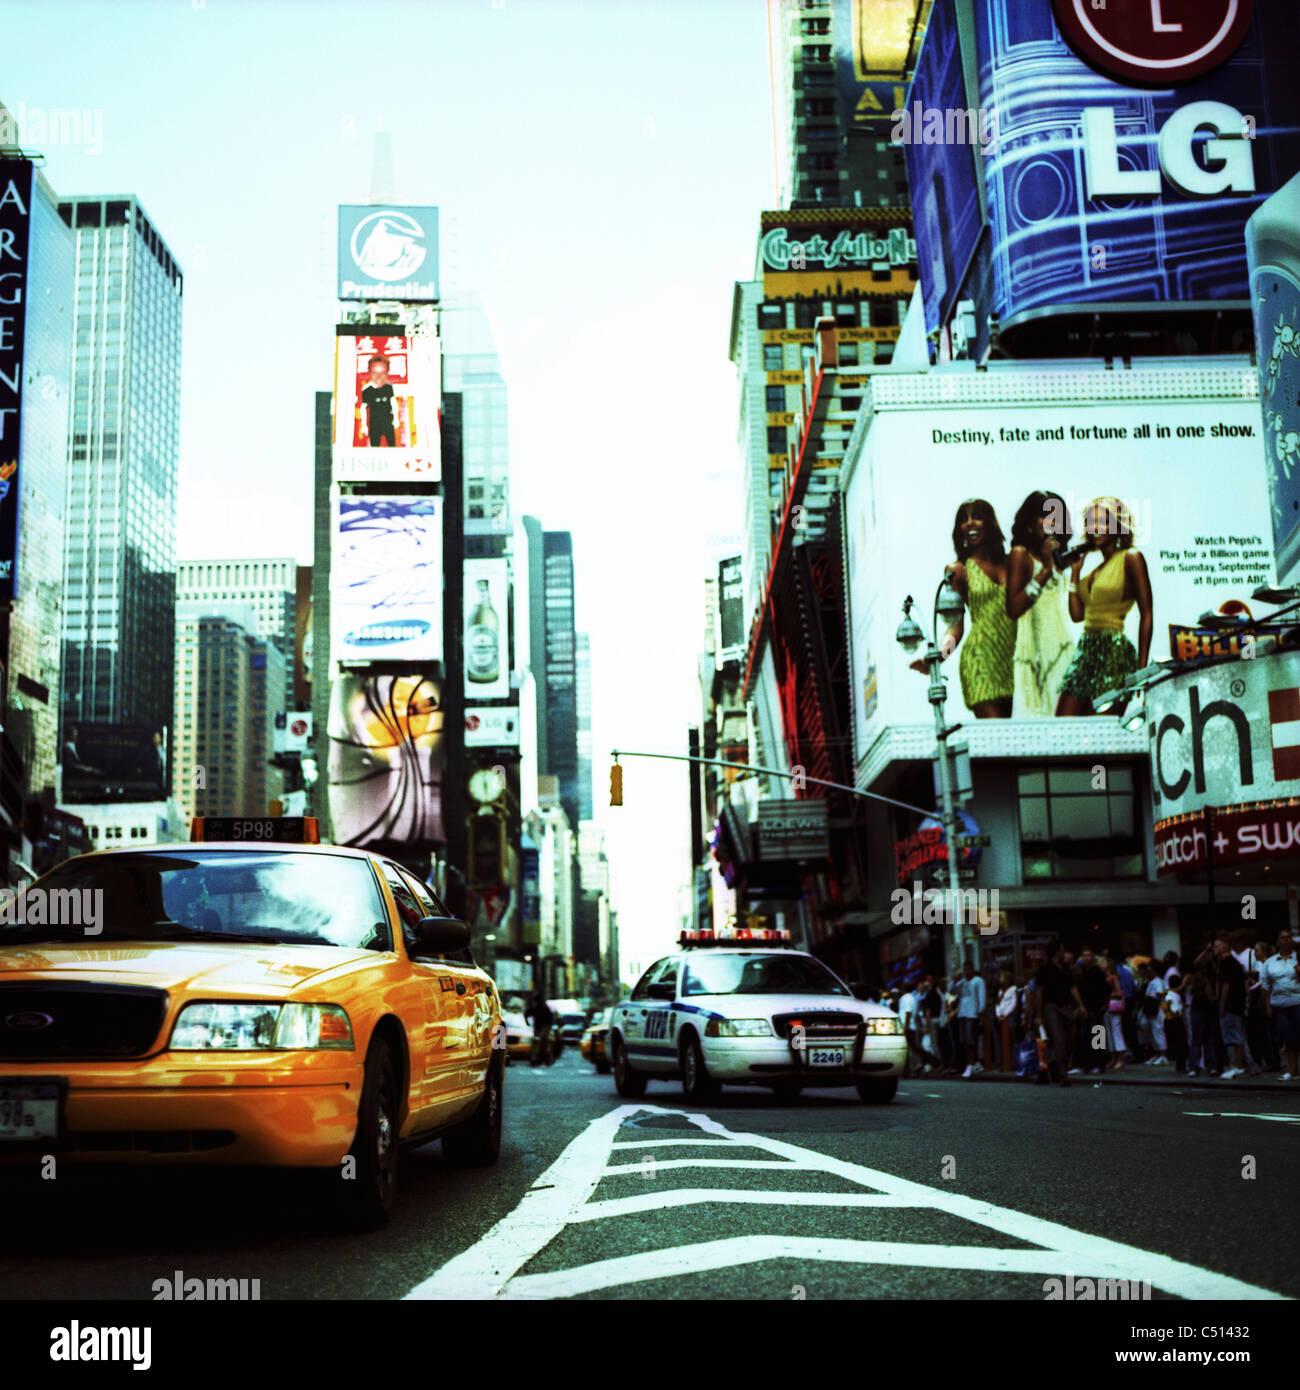 Busy street, Times Square, Manhattan, New York City, USA - Stock Image